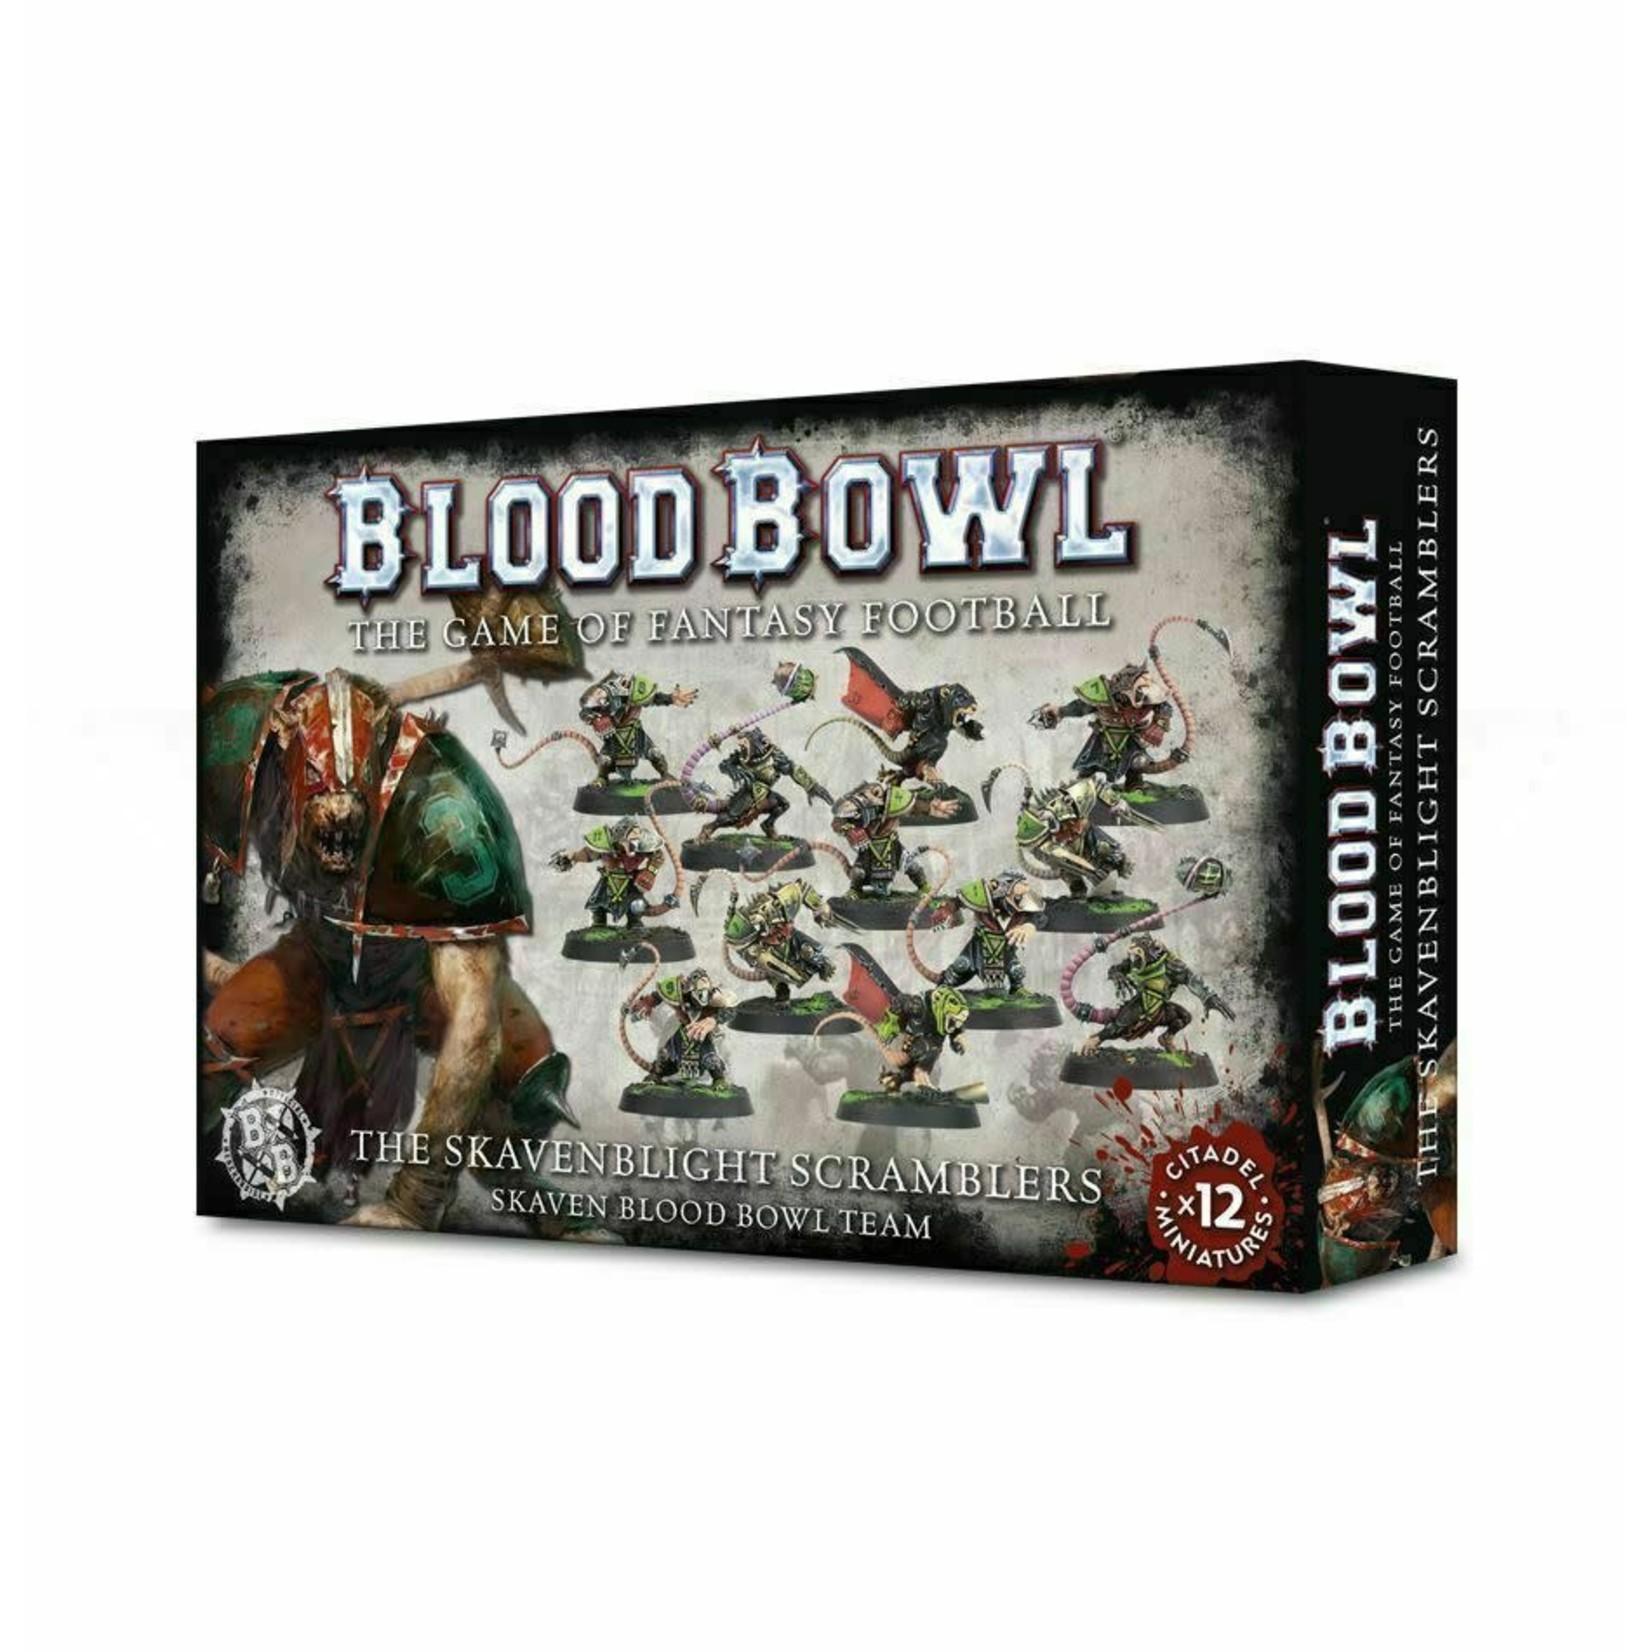 Blood Bowl: The Skavenblight Scramb